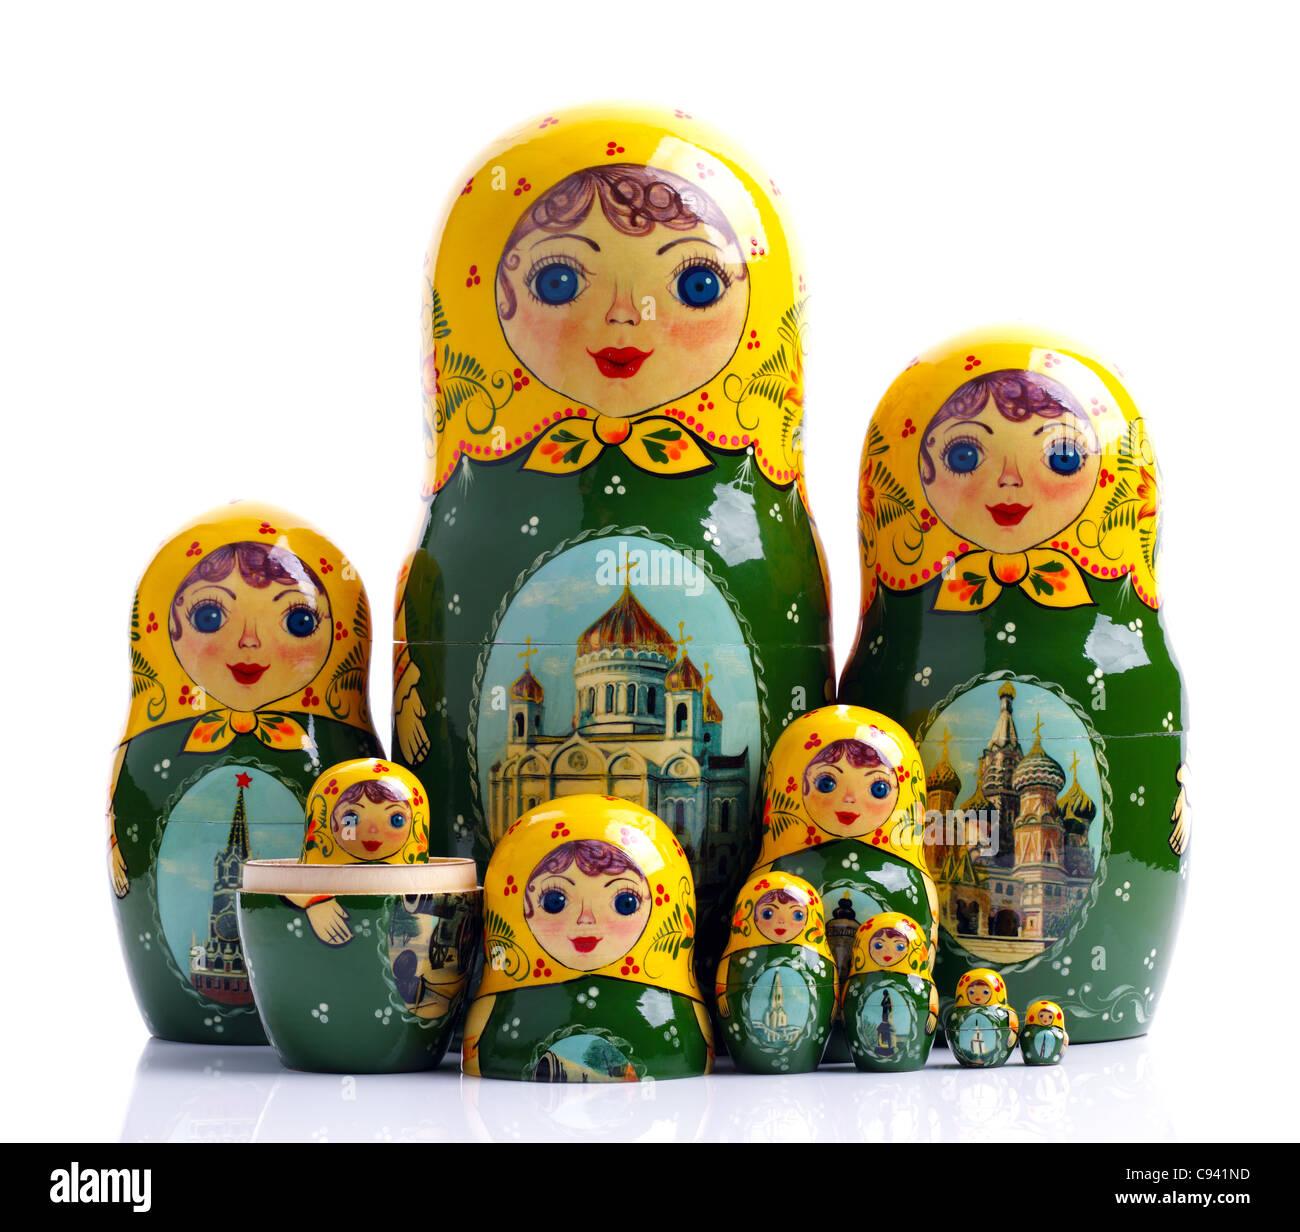 Matryoshka - Russian nested dolls - Stock Image